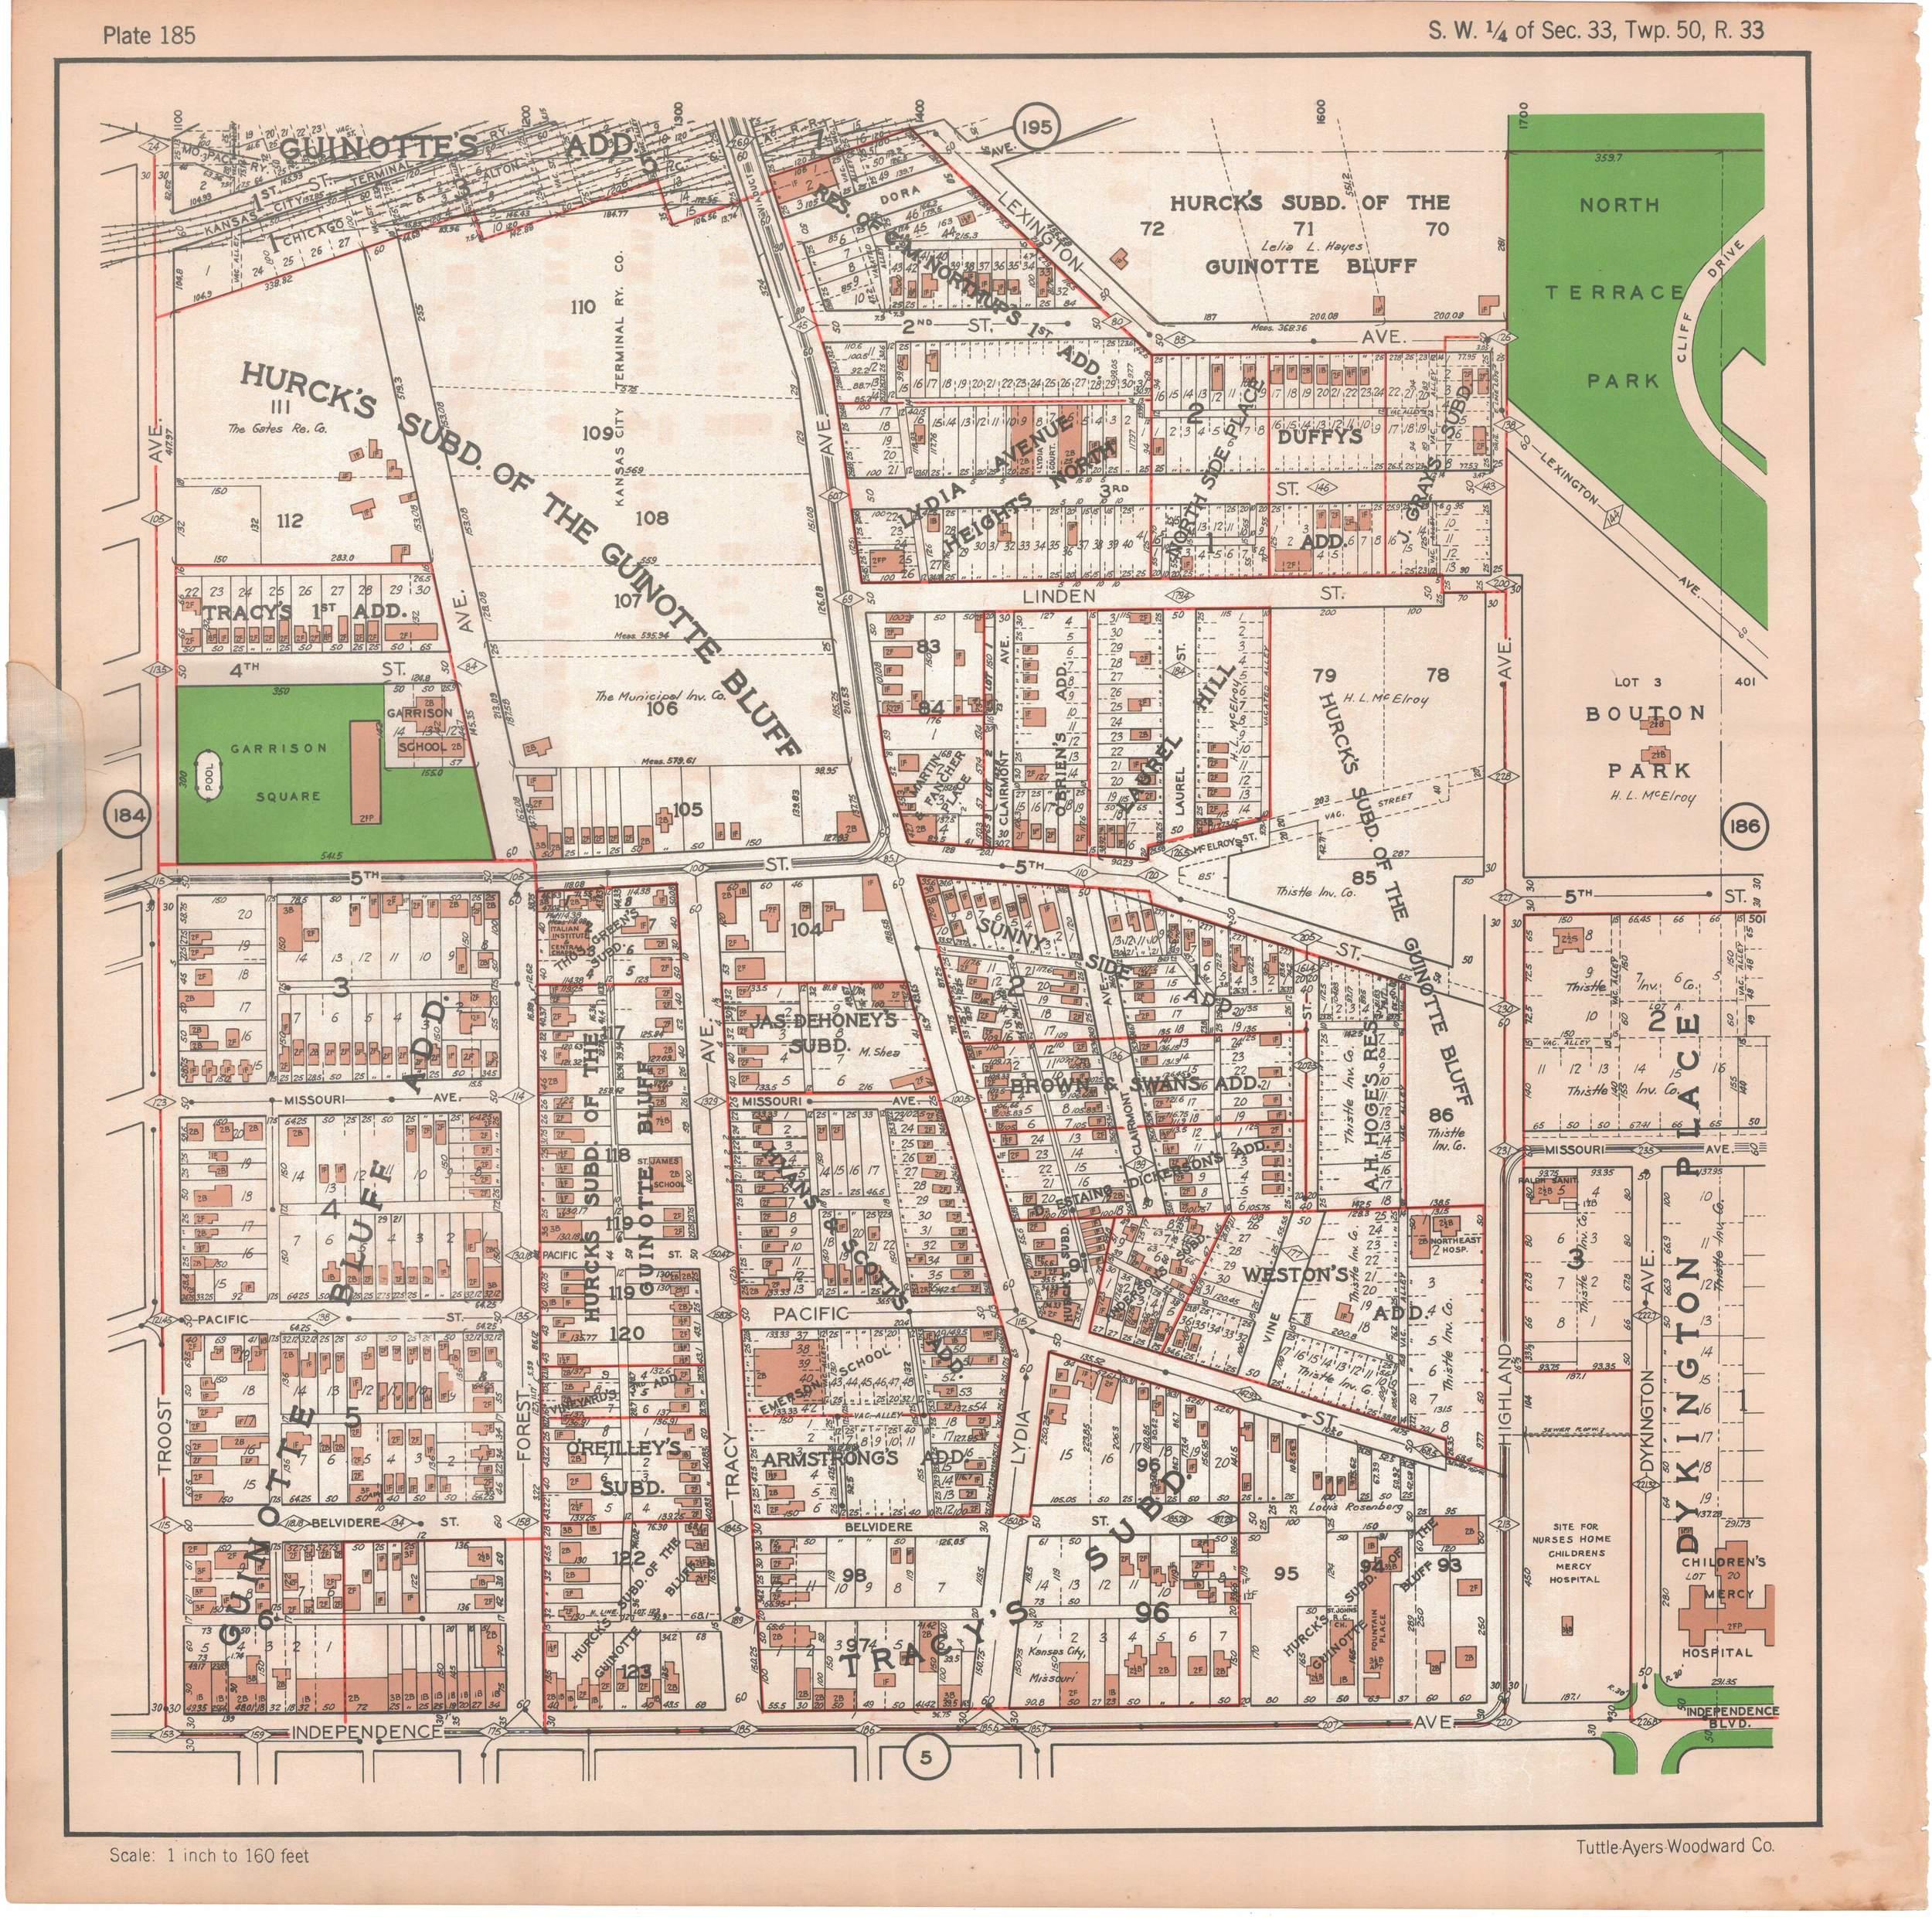 1925 TUTTLE_AYERS_Plate_185.JPG